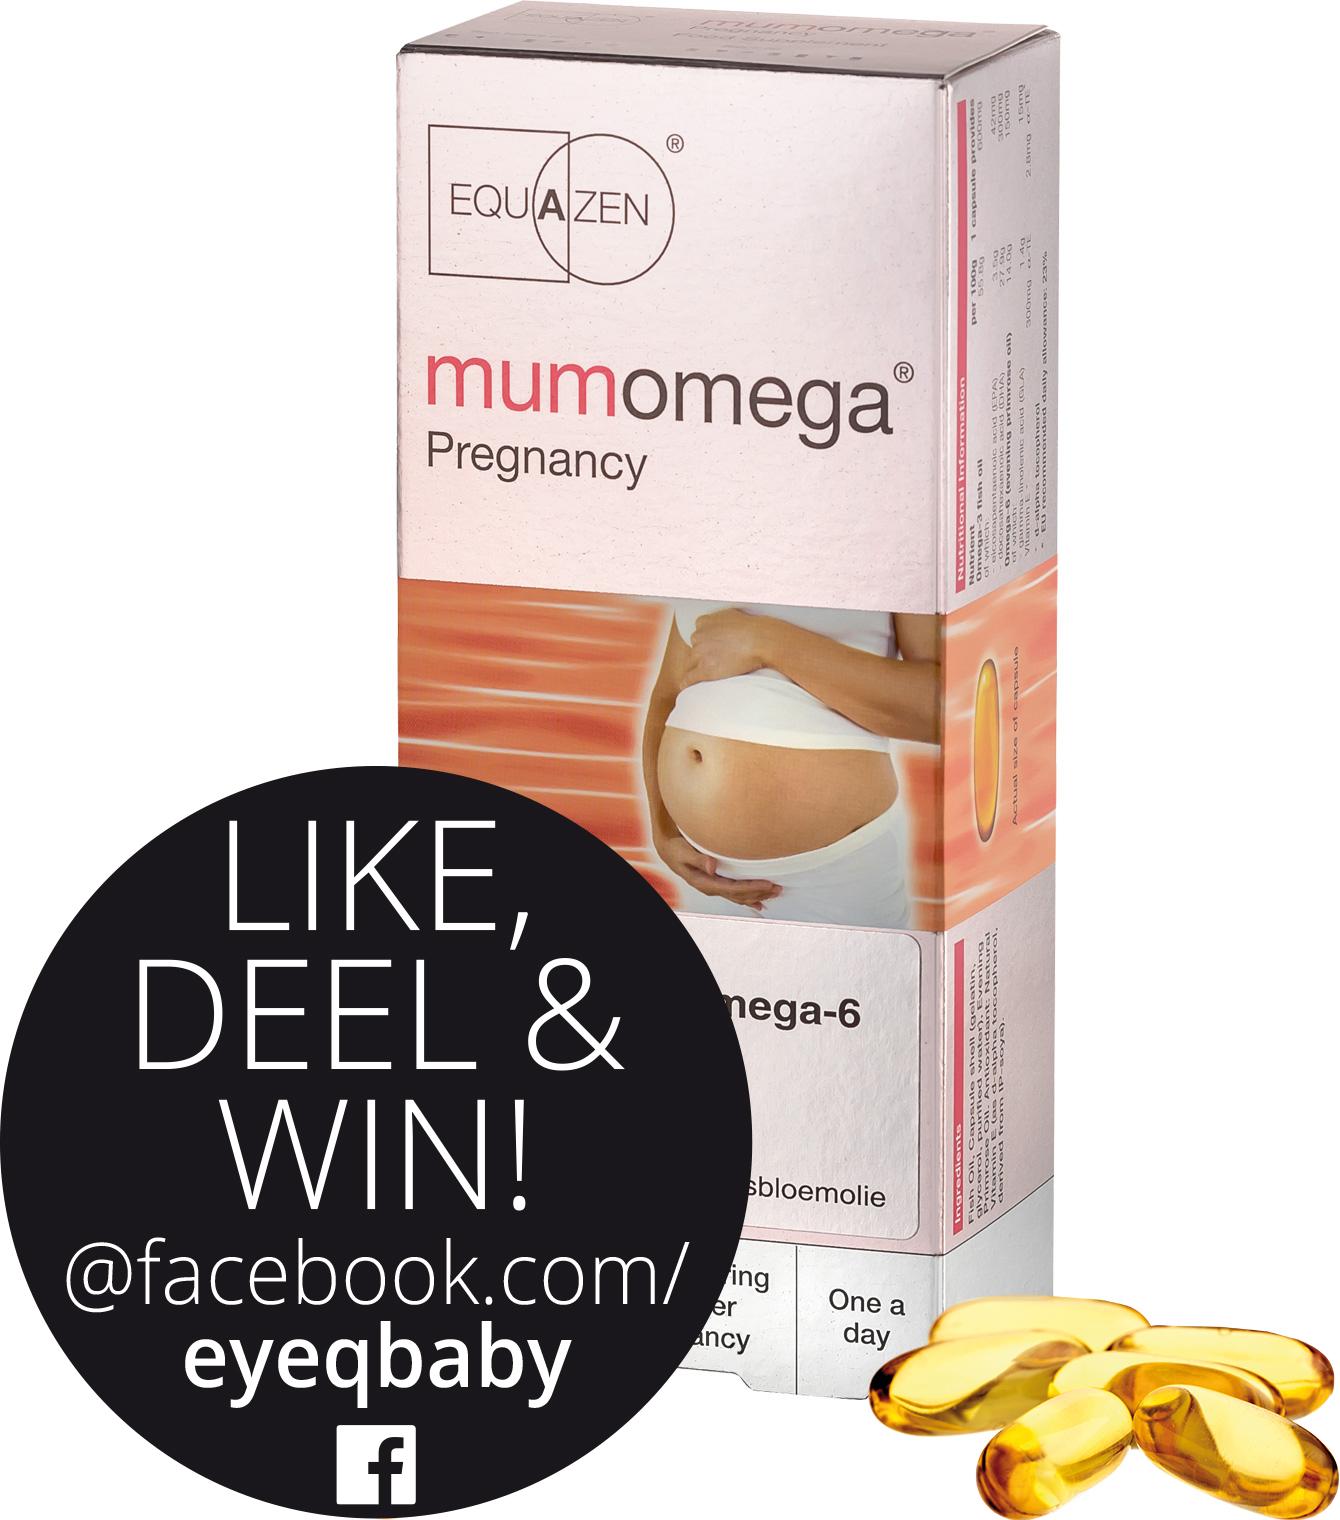 MumOmega - Like, deel & win op facebook.com/eyeqbaby